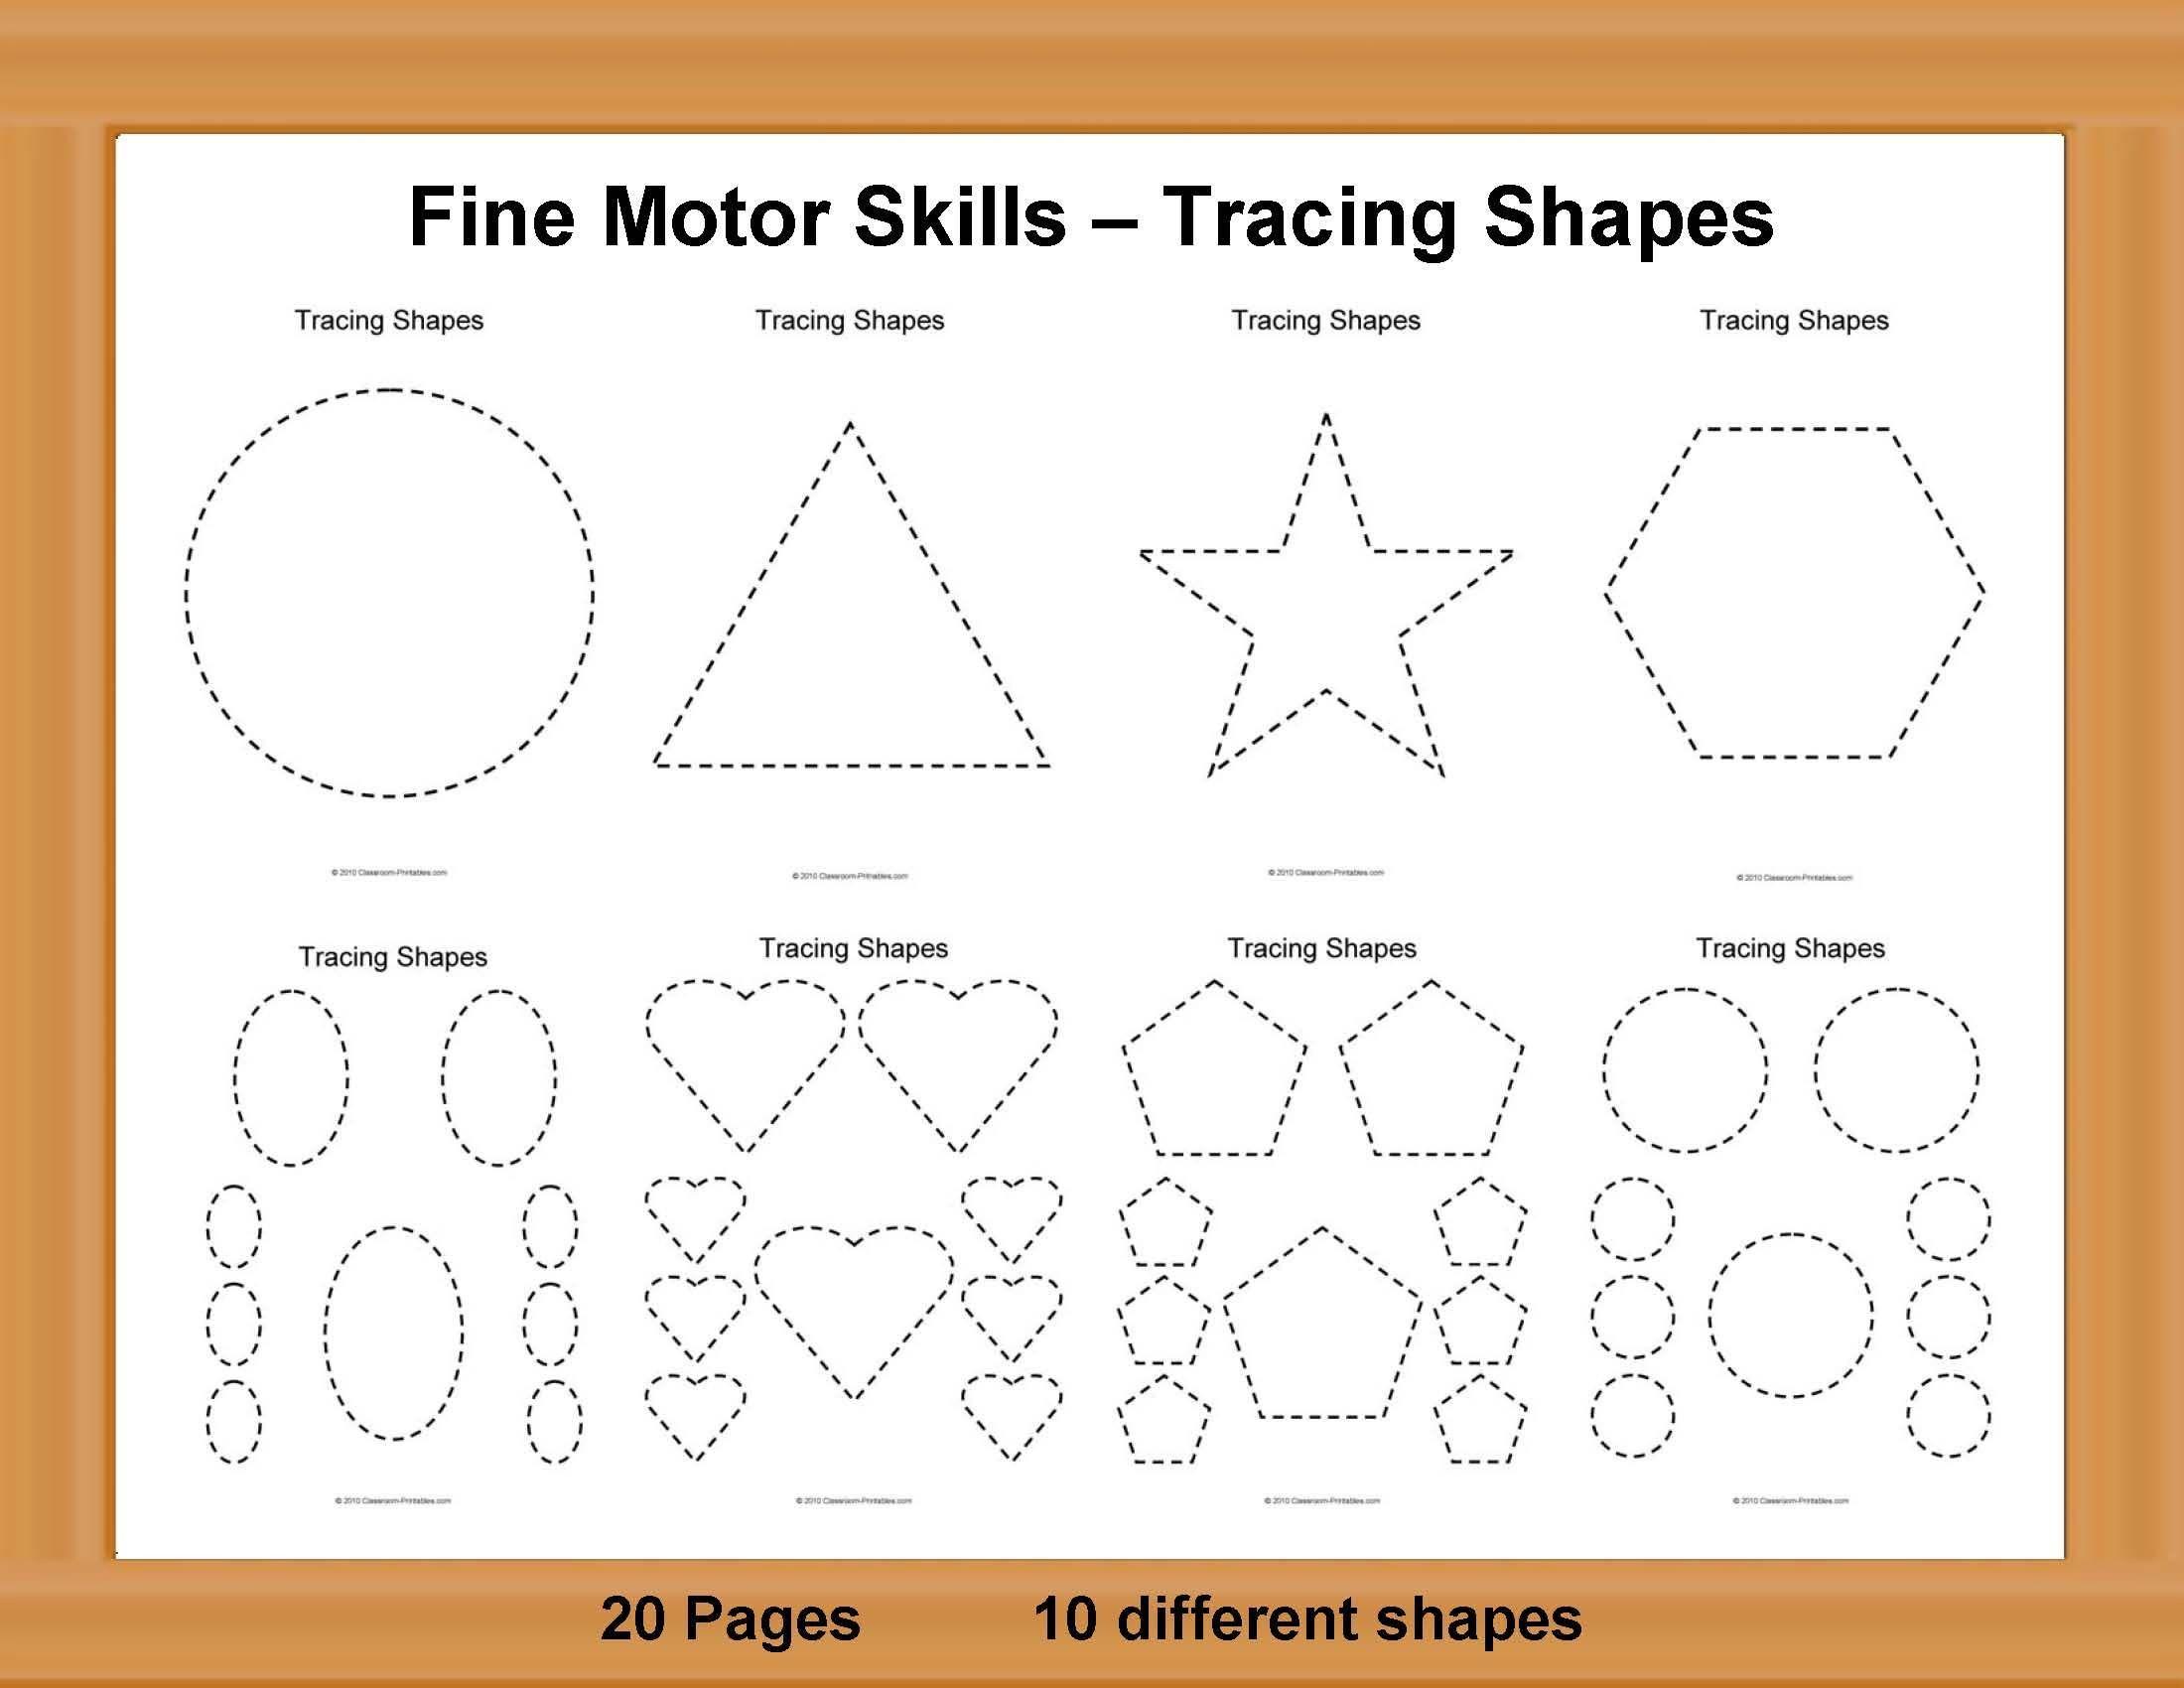 Fine Motor Skills Worksheets In